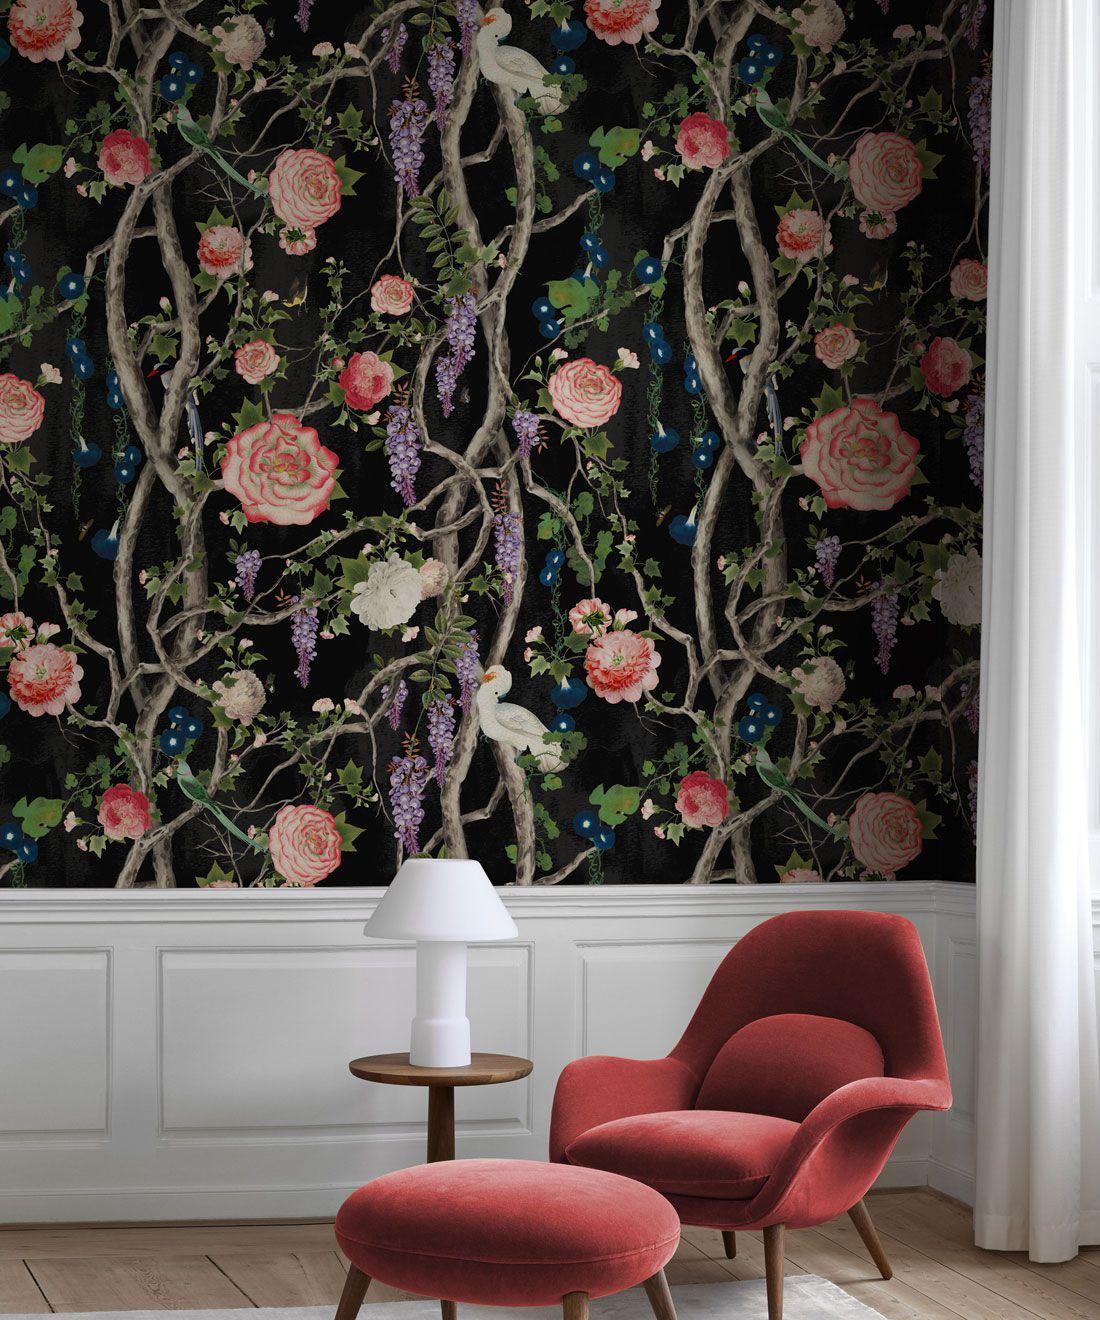 Empress Wallpaper • Romantic Wallpaper • Floral Wallpaper • Chinoiserie Wallpaper • Black Night colour wallpaper insitu